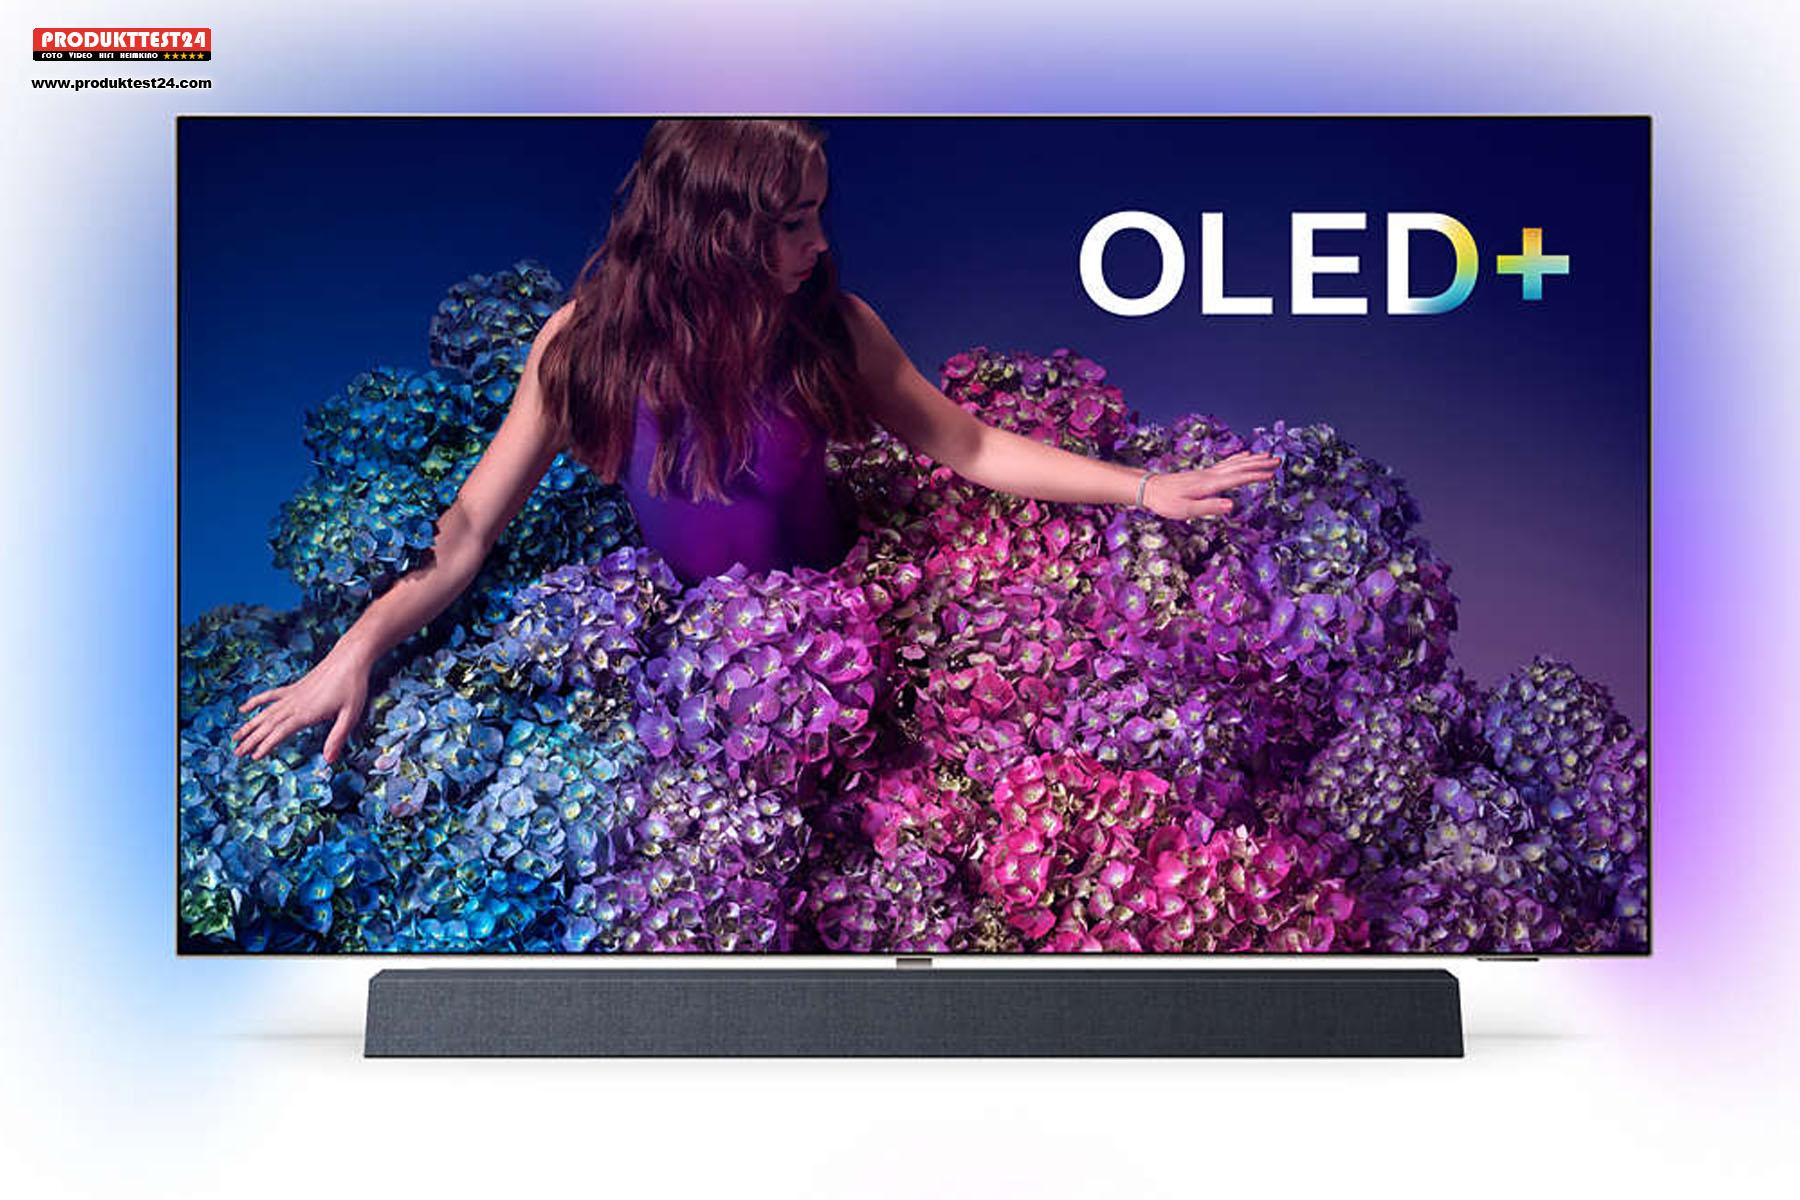 Der Philips 55OLED934/12 OLED+ 4K-Fernseher